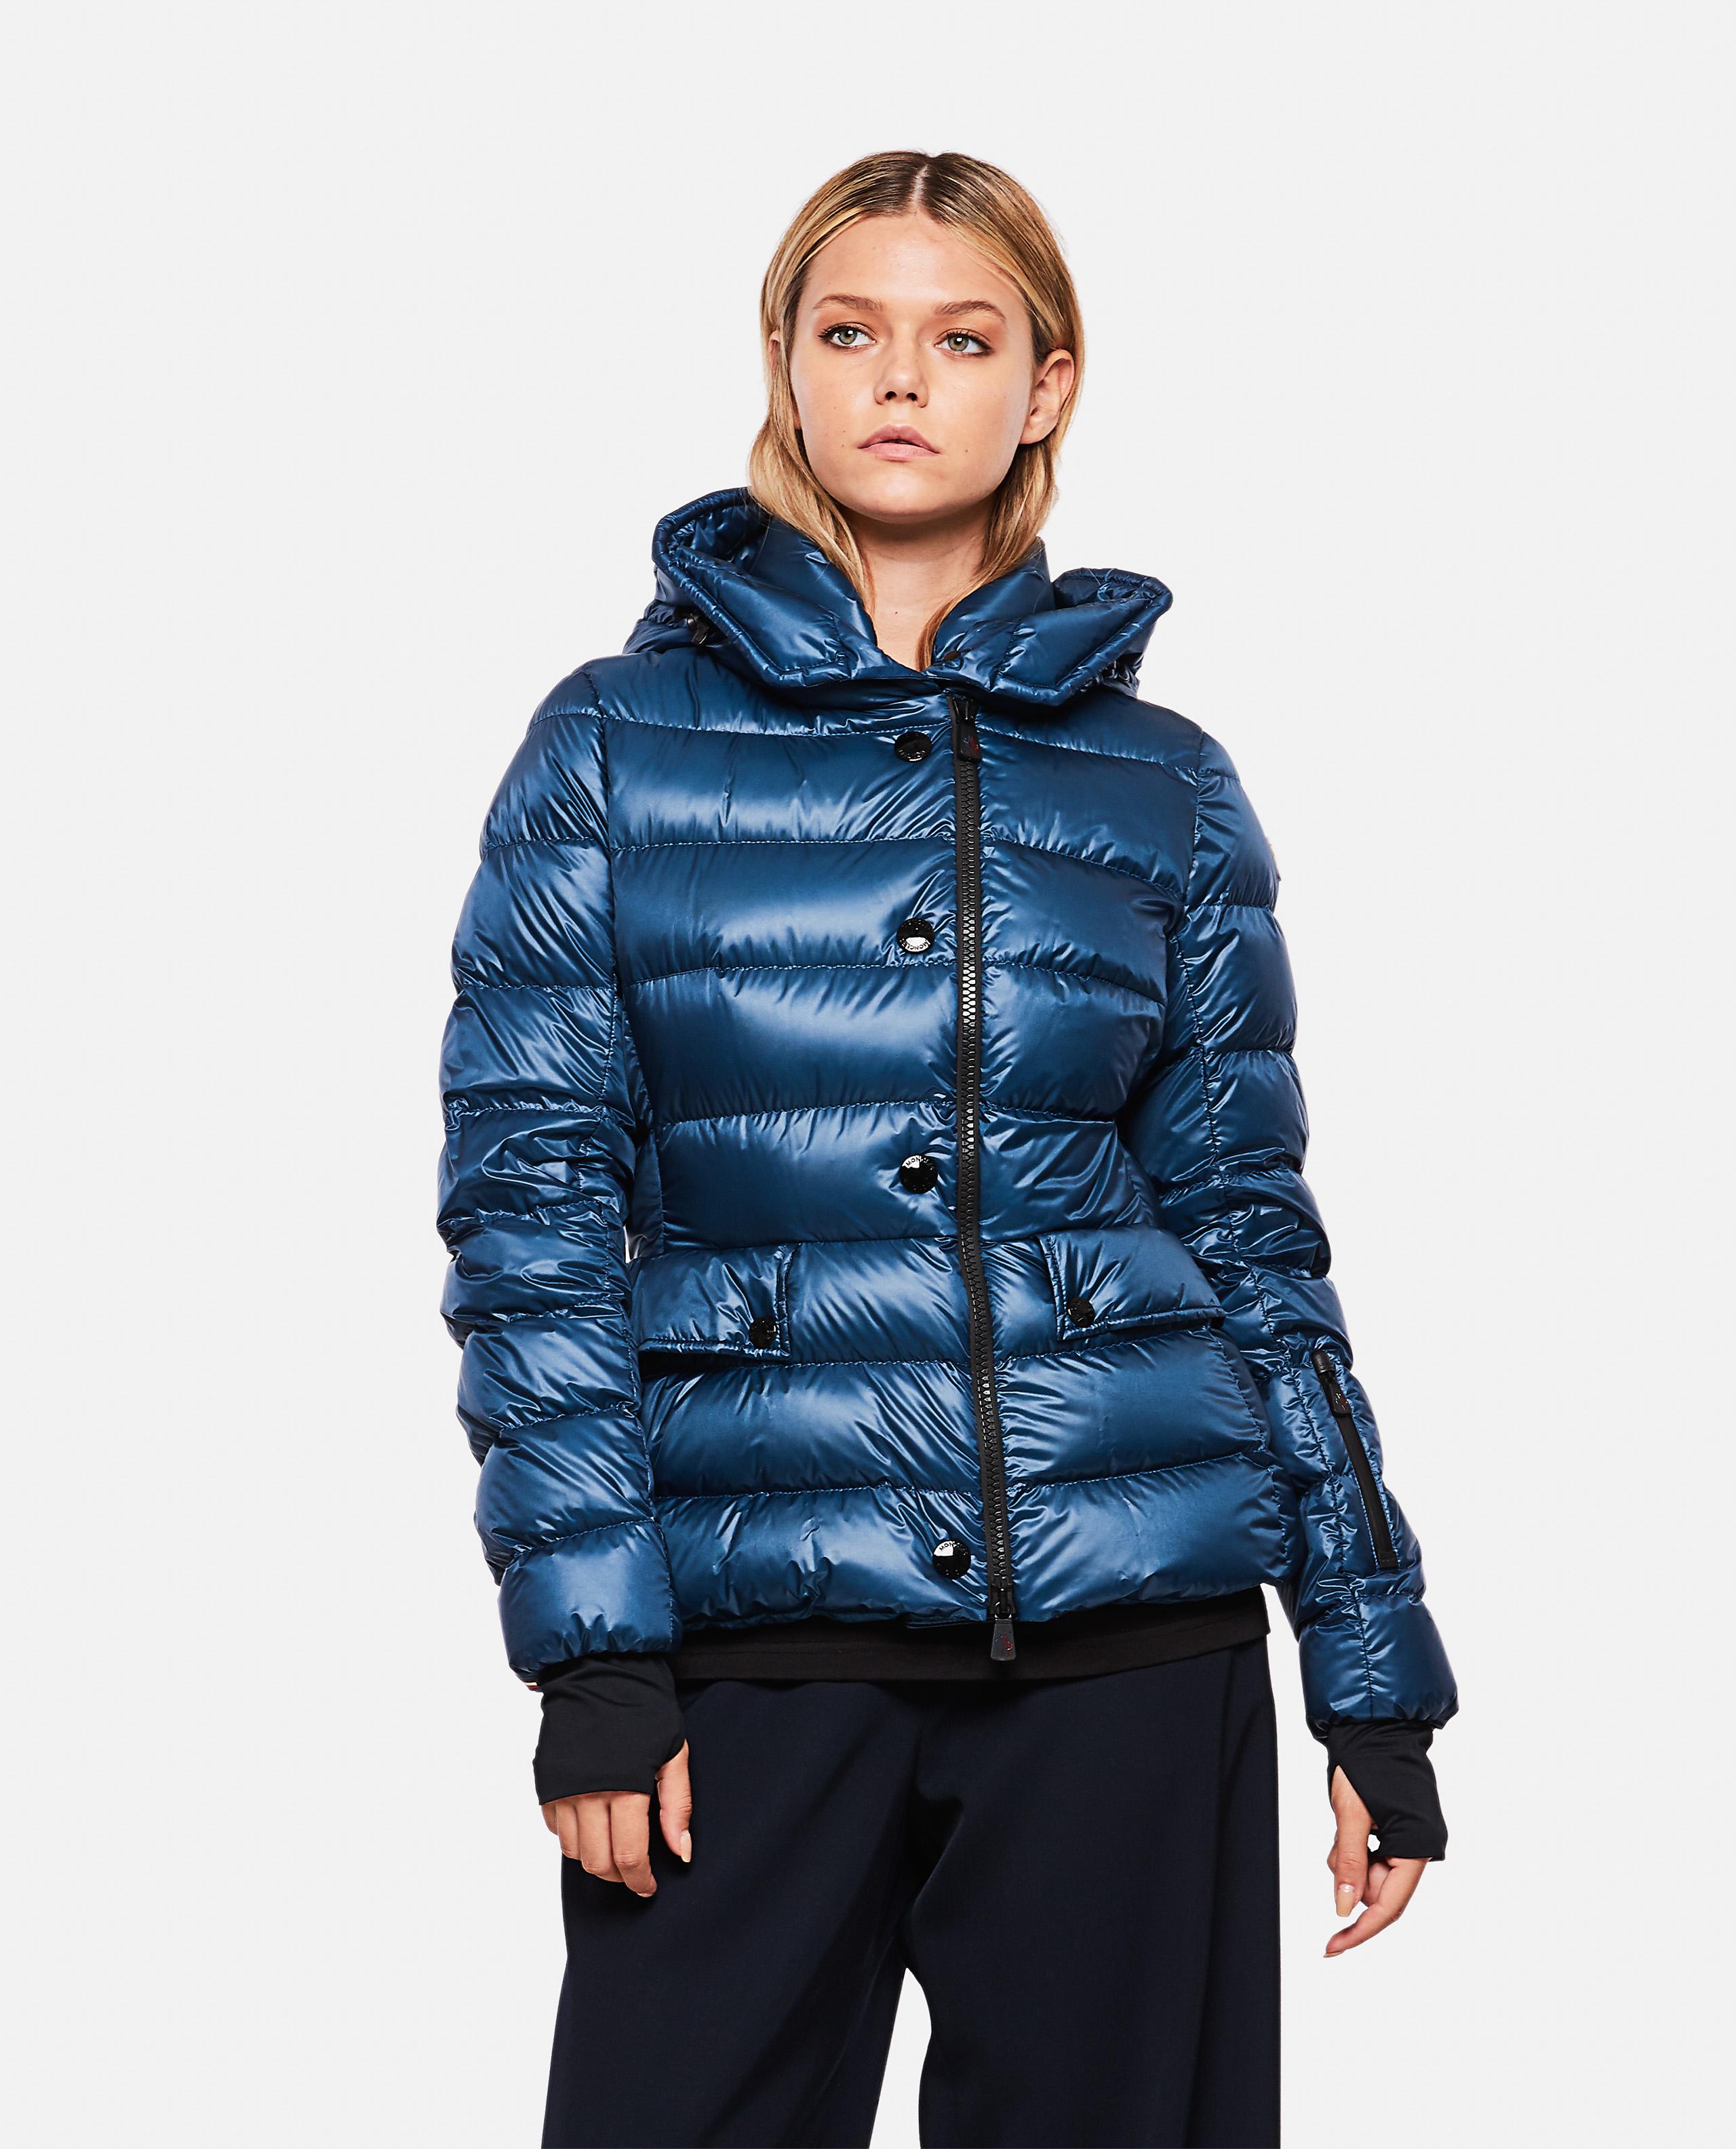 Moncler Grenoble harmonic down jacket